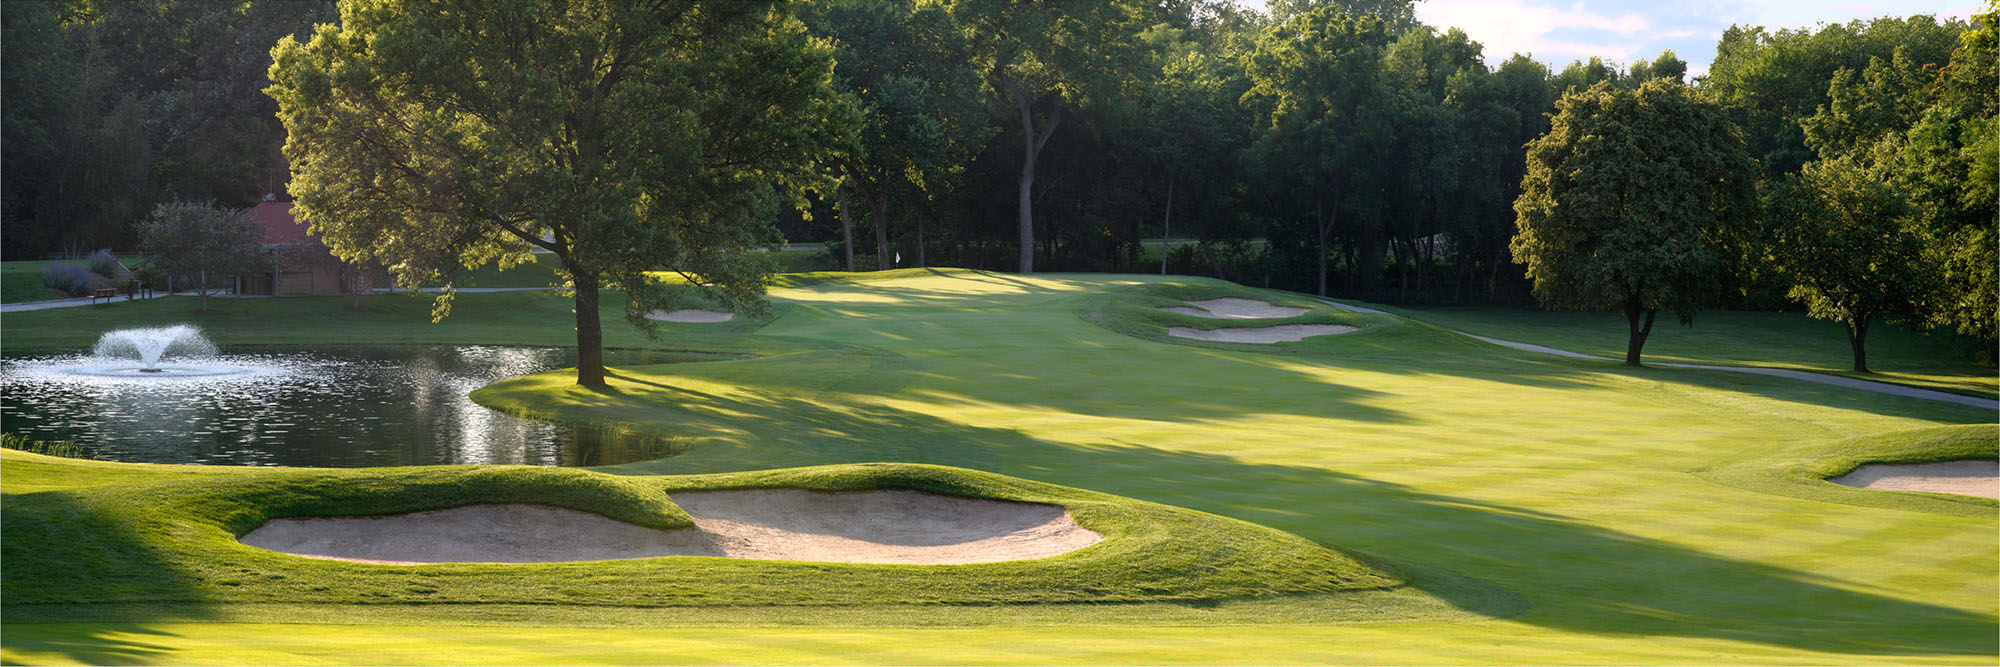 Golf Course Image - Happy Hollow Golf Club No. 4